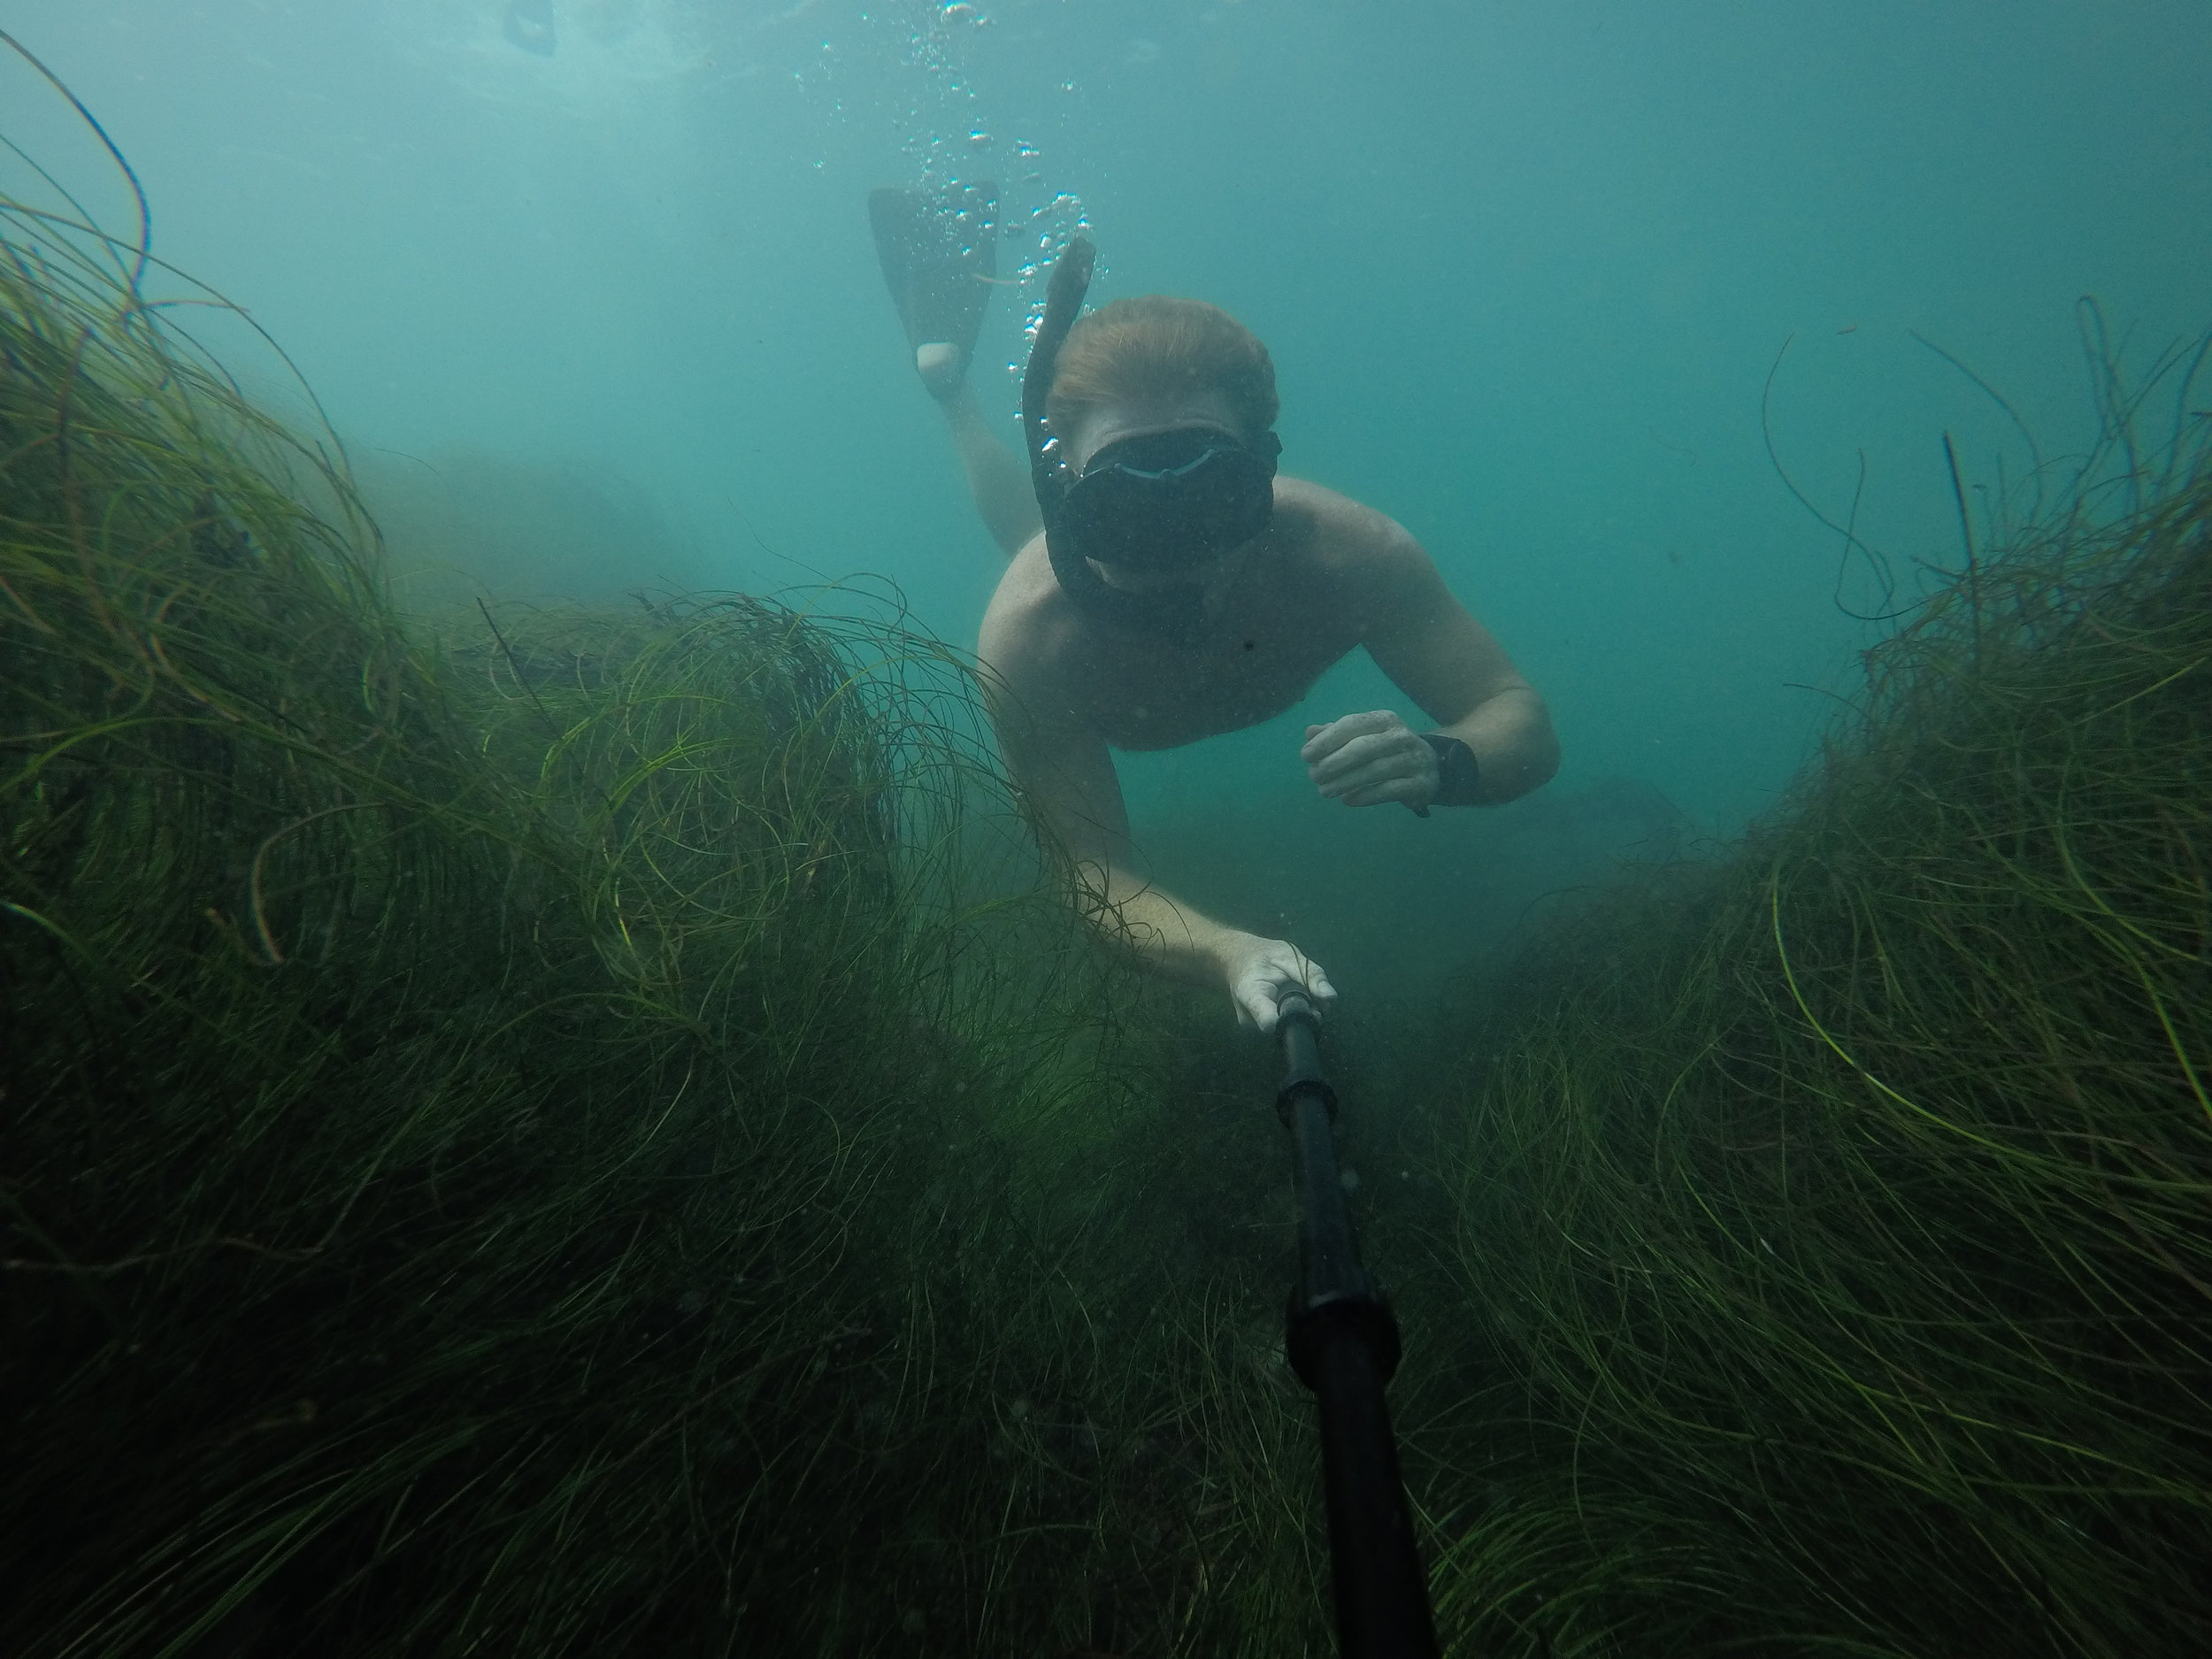 Dive water diving outdoors excursion SEA laguna beach CA Ella Lea Eric Belisa Chad Seal PUPs G0080761 (1).JPG